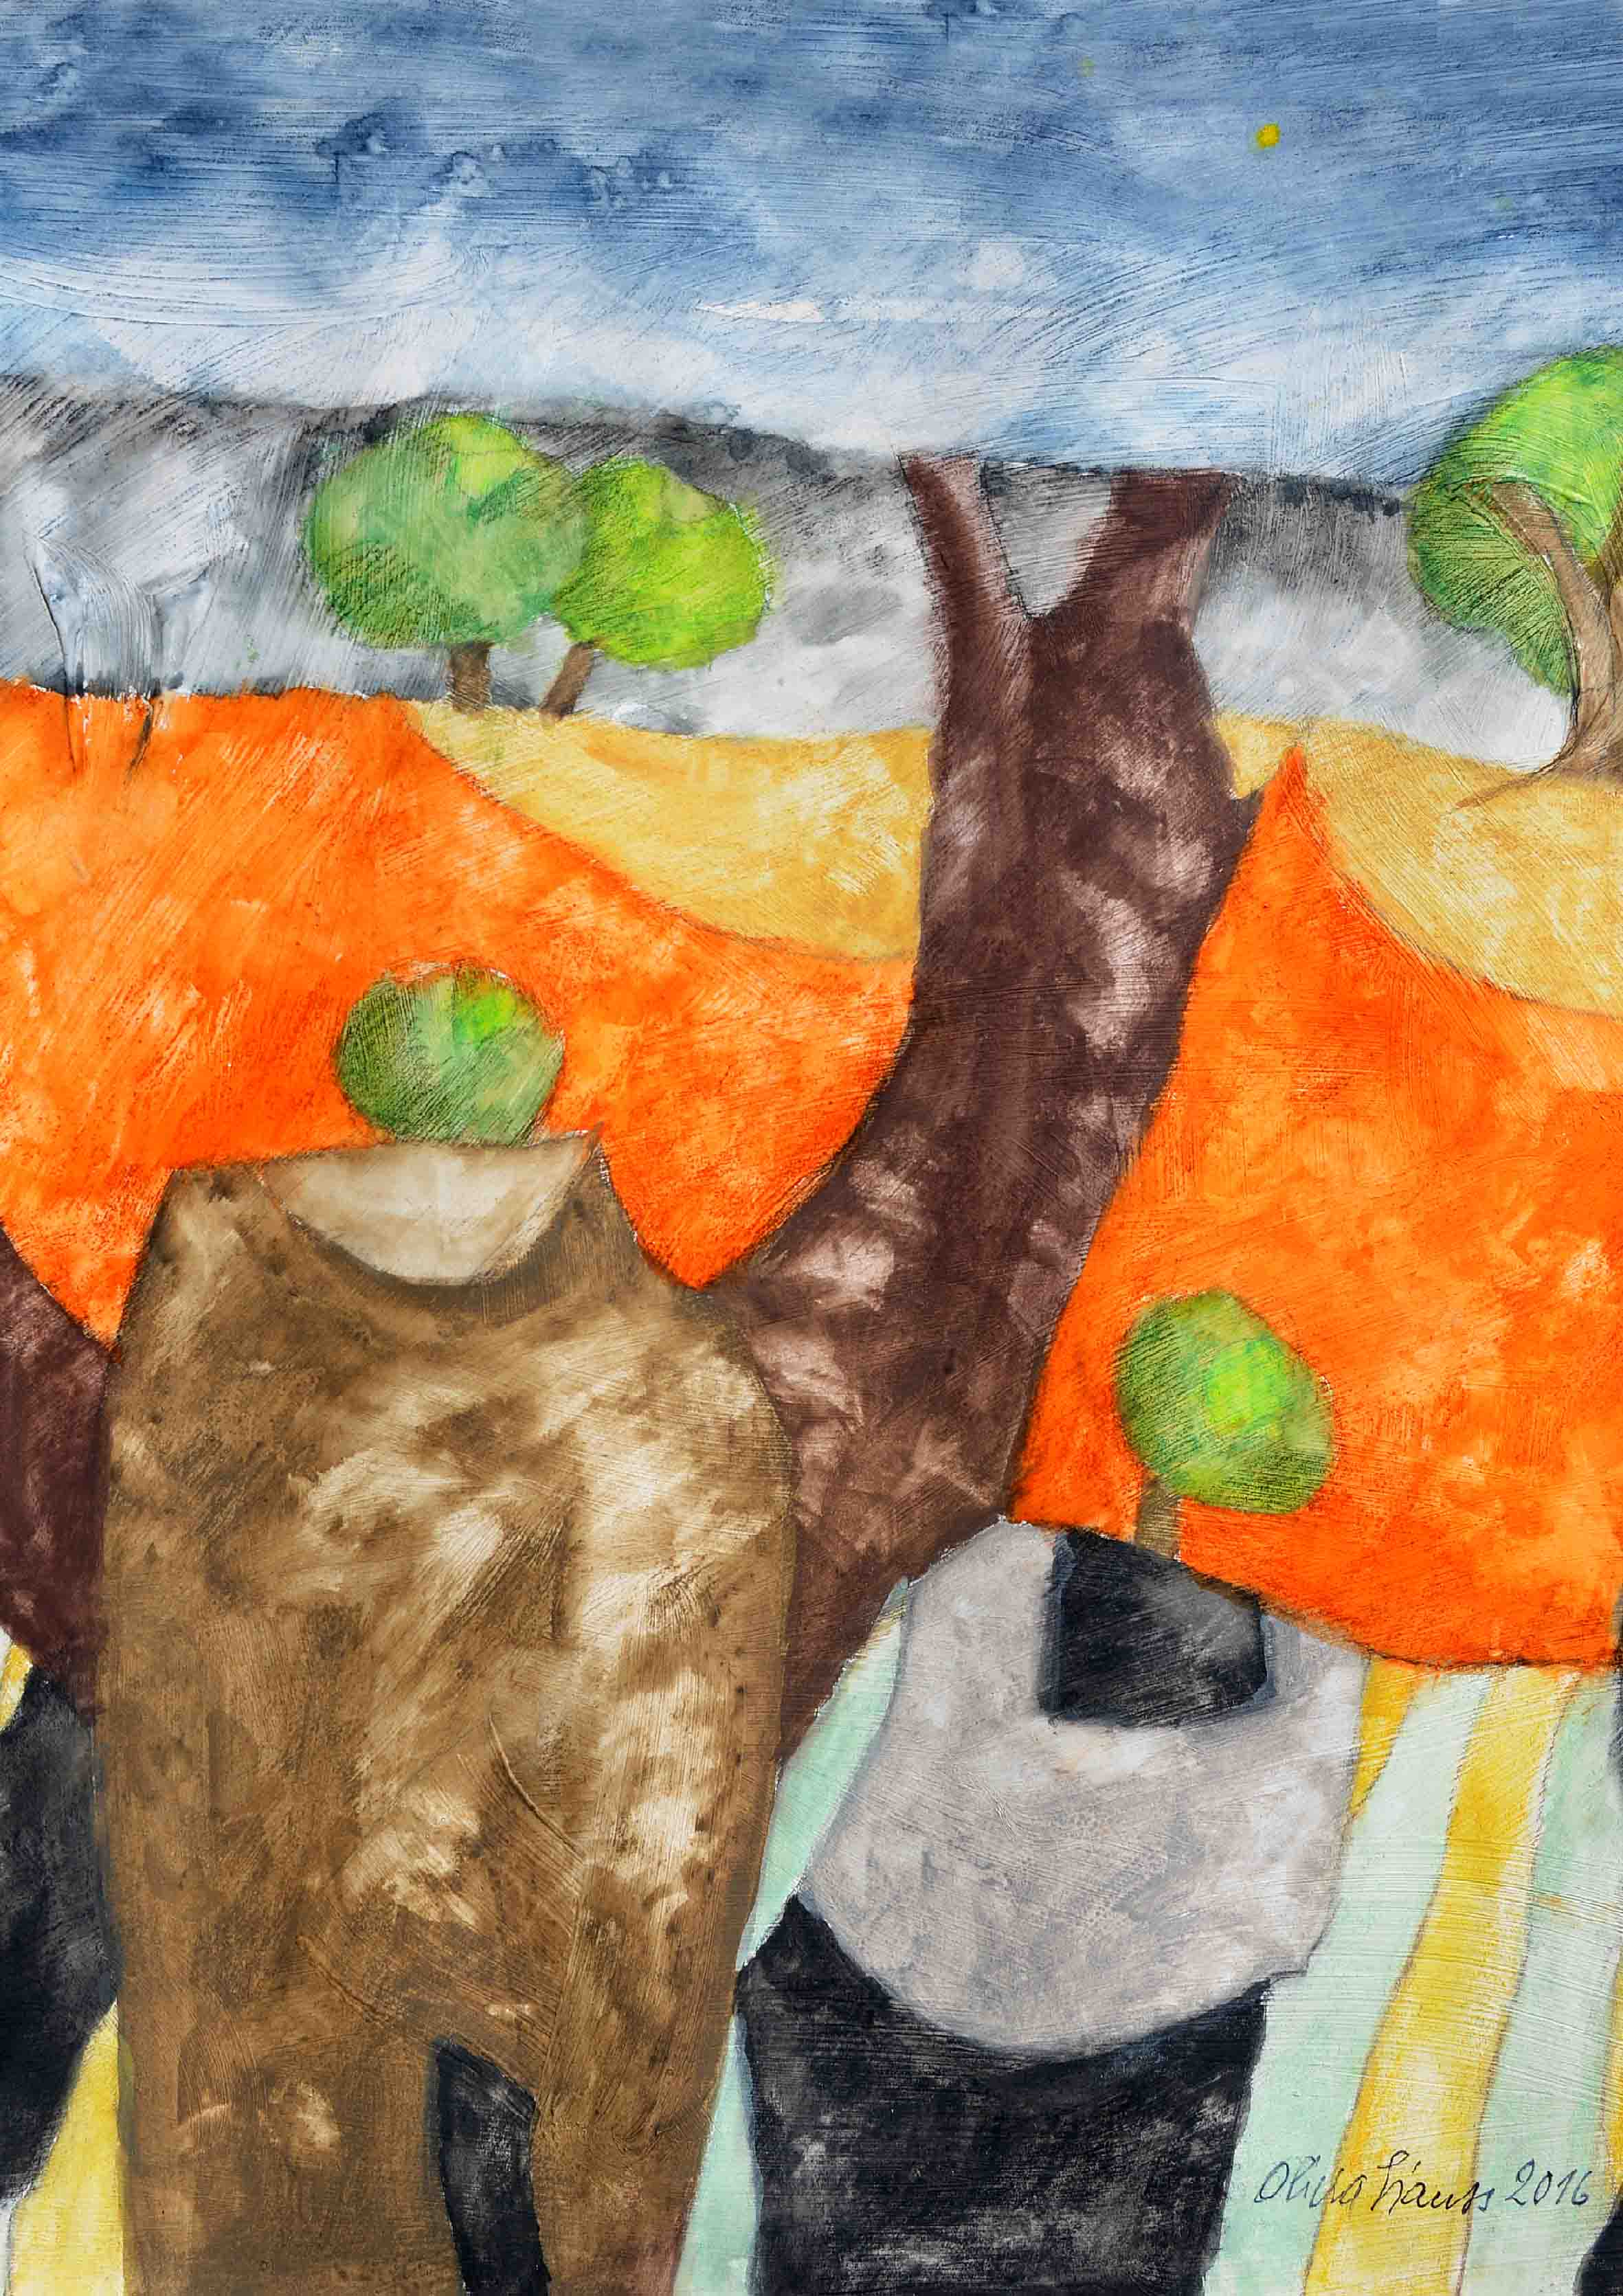 1-olivia-siauss-campo-di-grano-partic-cop-ponte-rosso